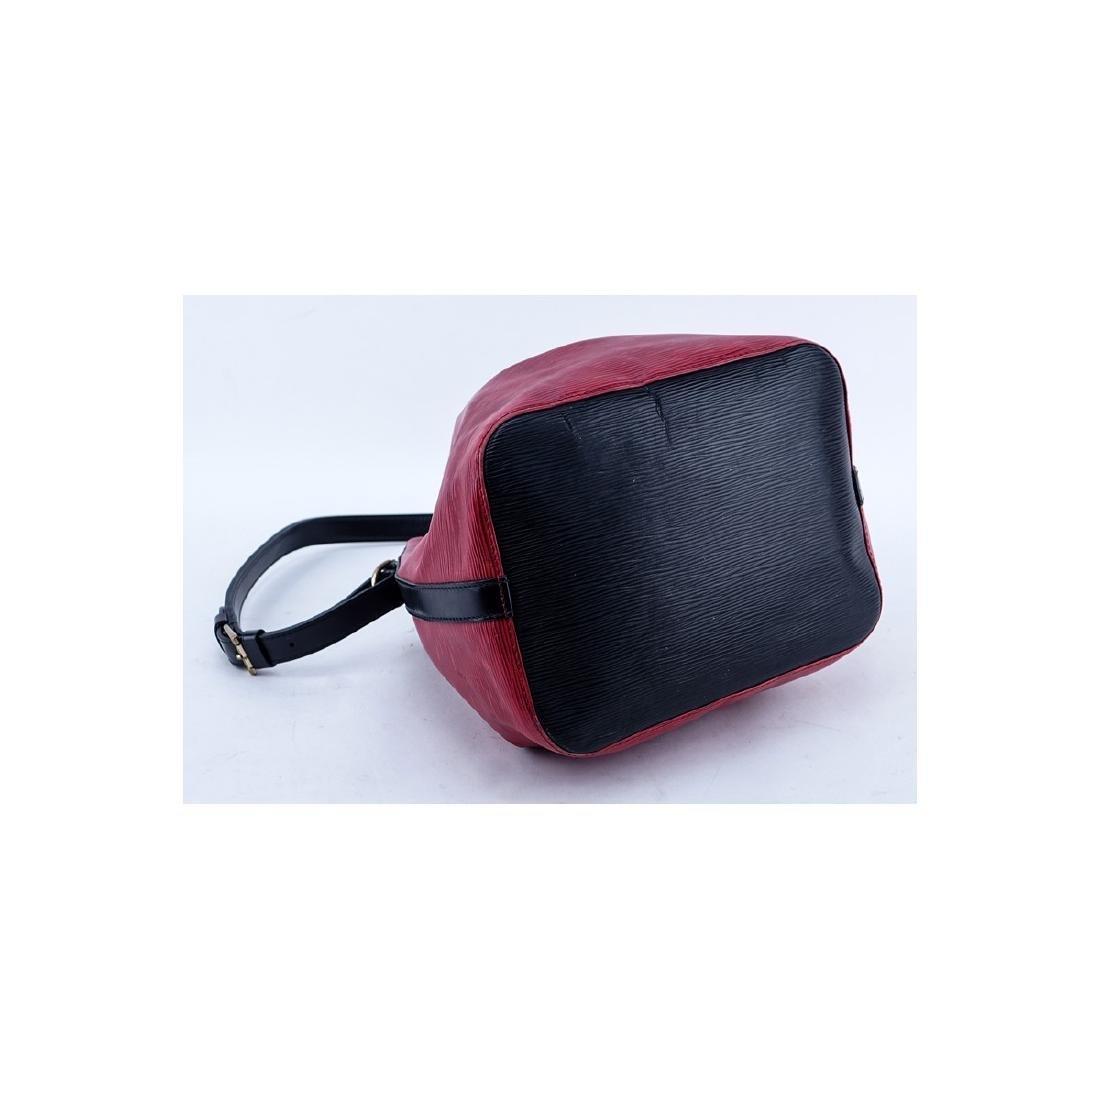 Louis Vuitton Red/Black Epi Leather Noe Bicolor - 3